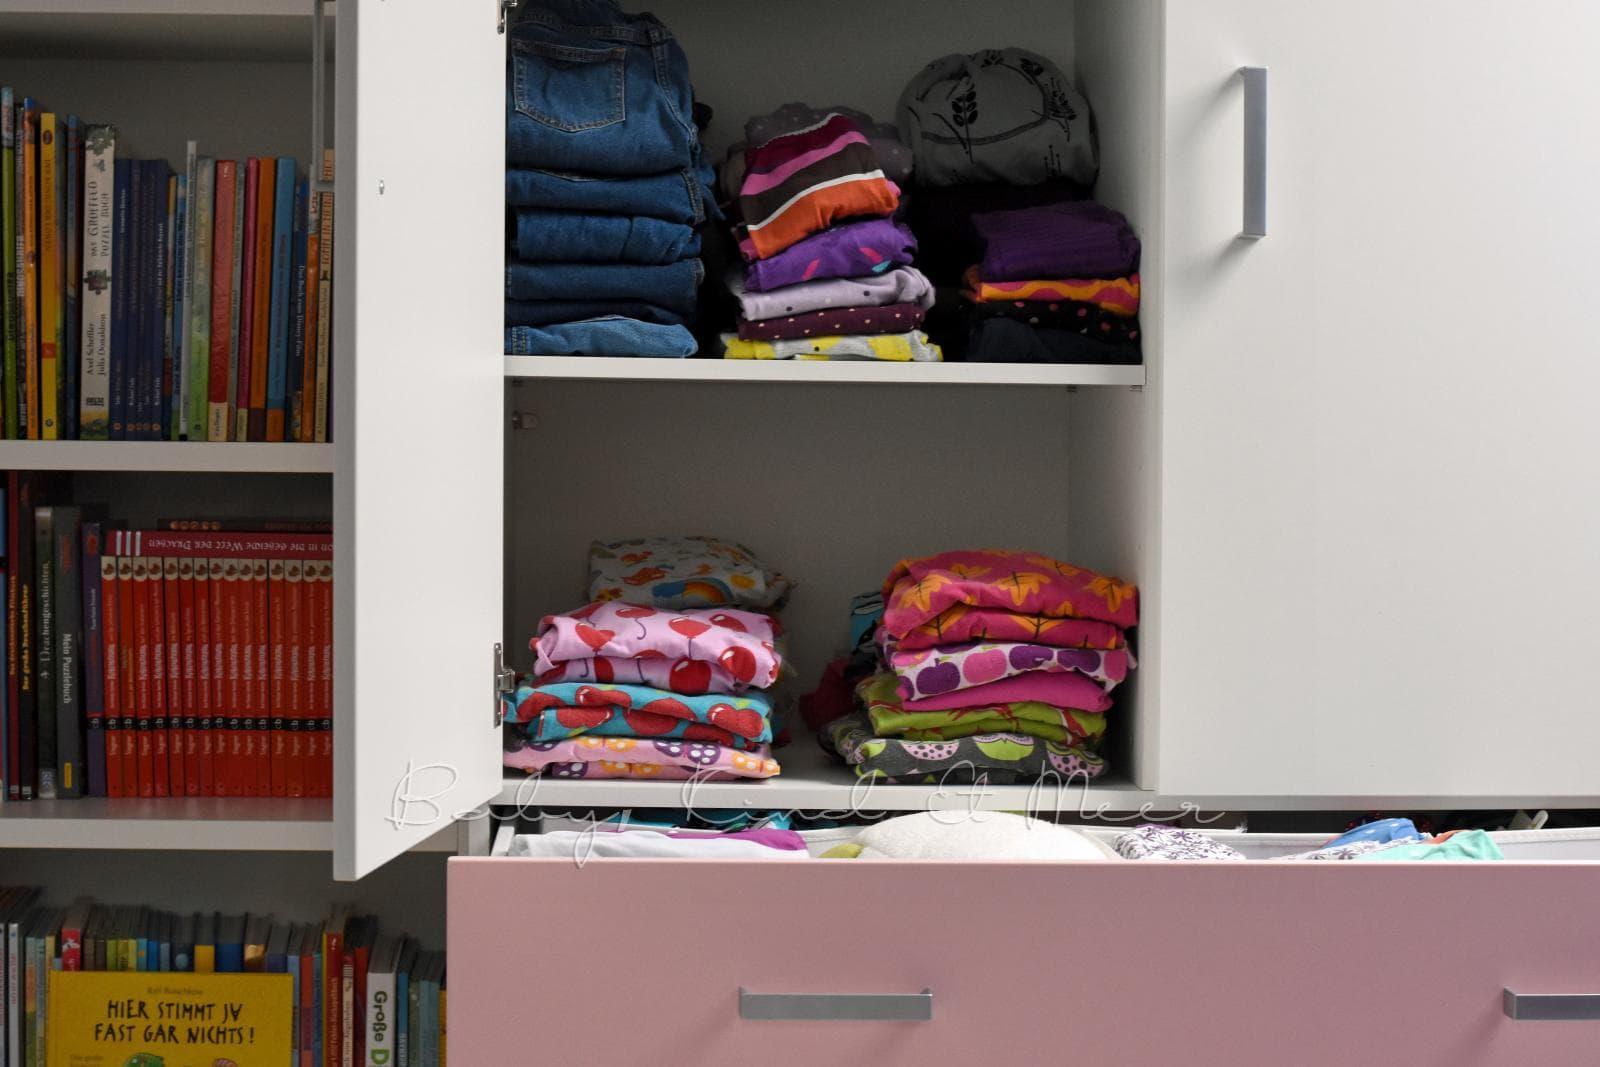 fr hjahrsputz im kinderzimmer familienleben baby kind und meer. Black Bedroom Furniture Sets. Home Design Ideas